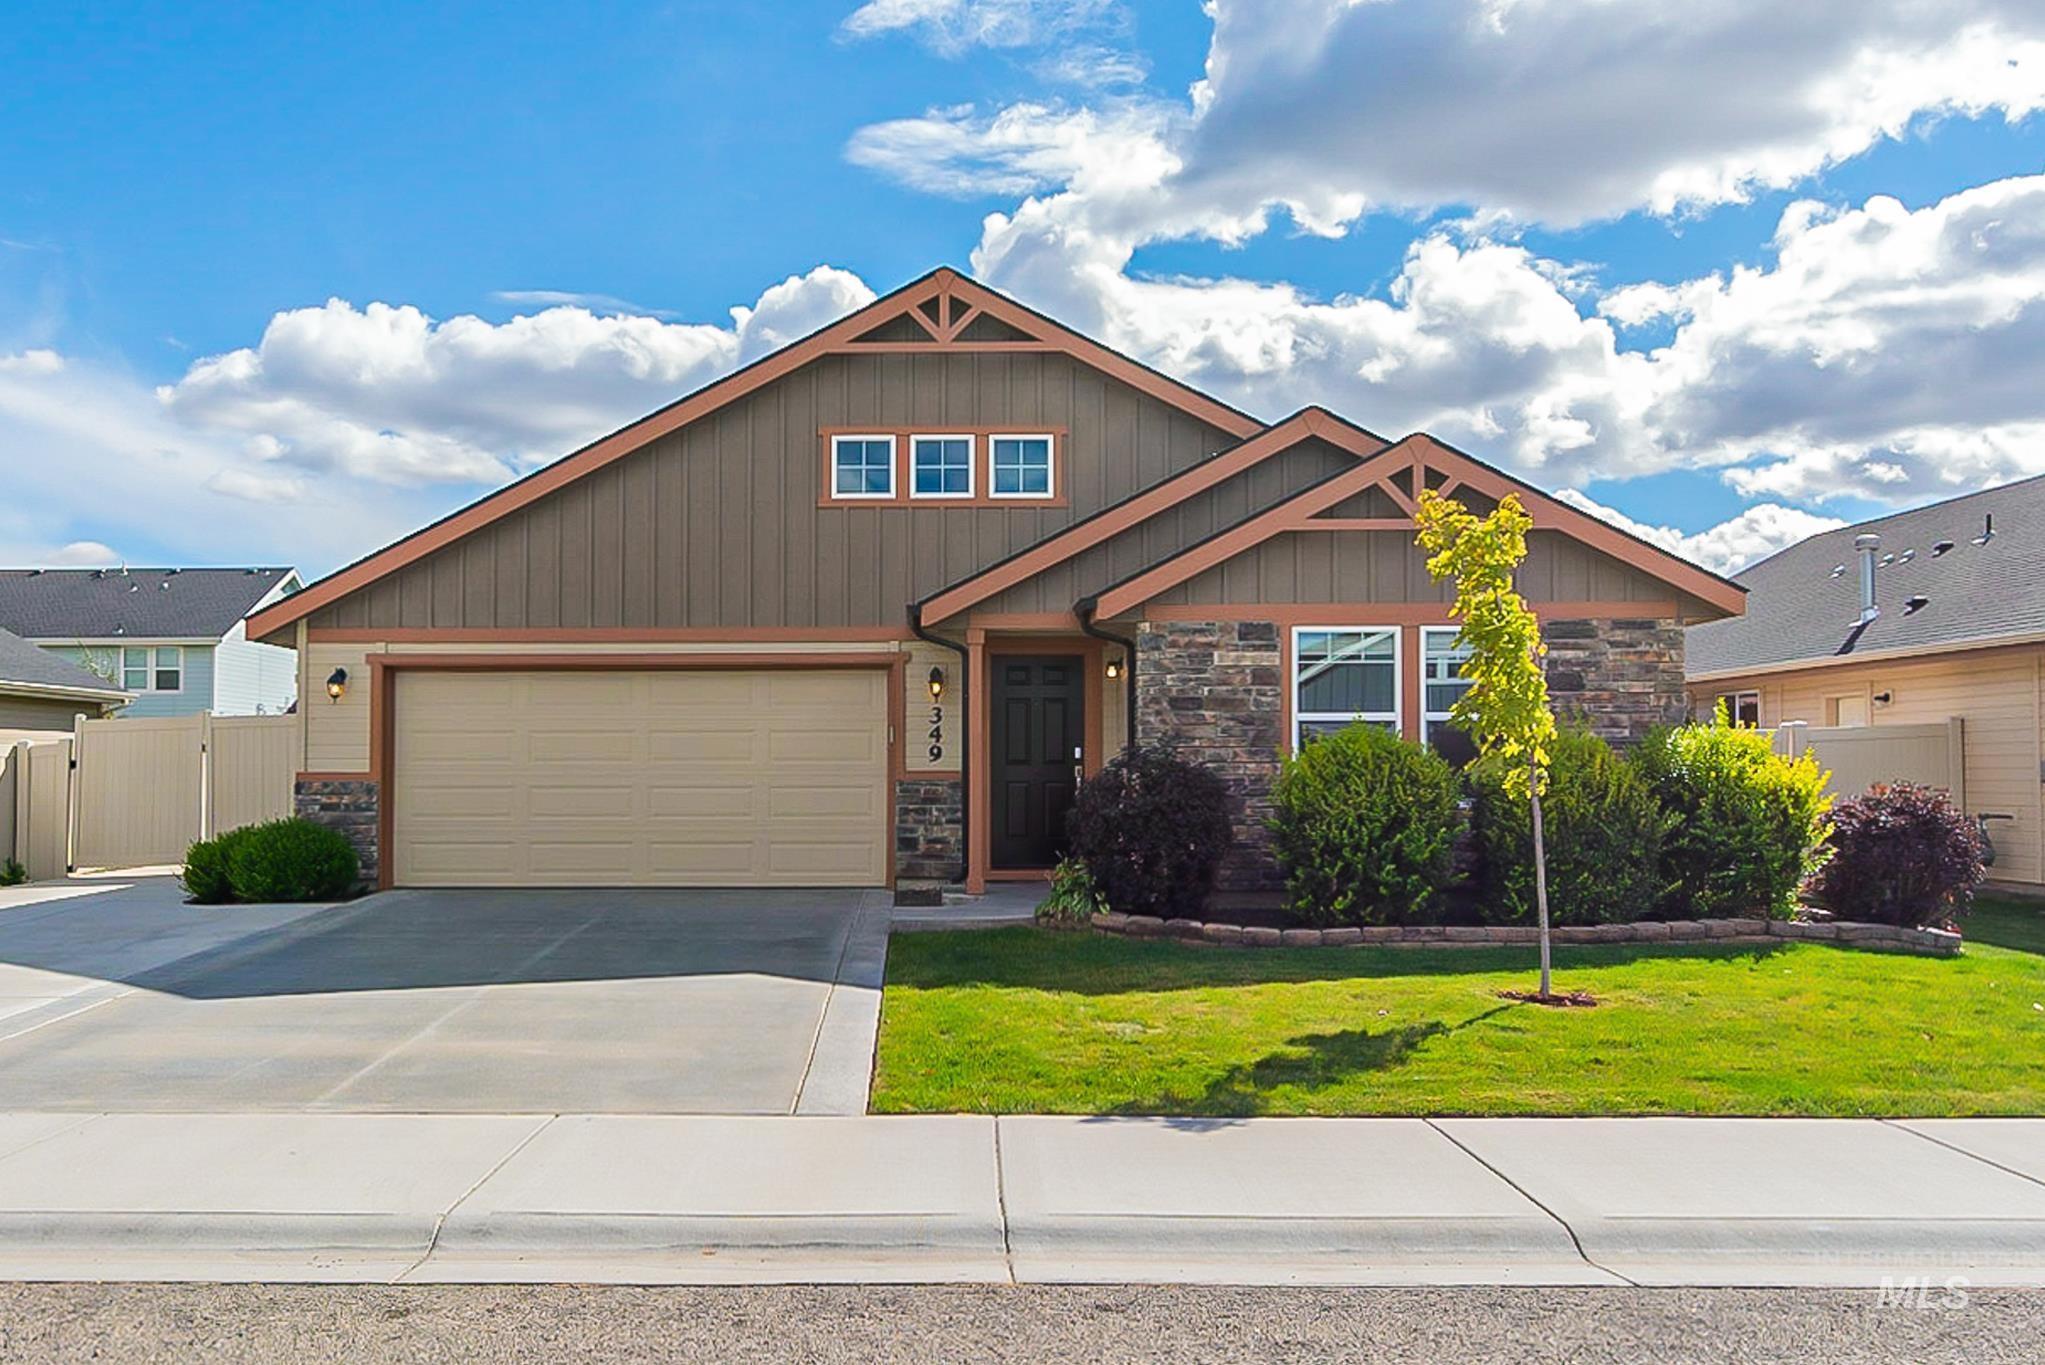 Built in 2016, this Meridian one-story home offers granite countertops, and a two-car garage. - Austin Najera, Main: 208-487-8417, Opendoor Brokerage LLC, Main: 480-351-6622,